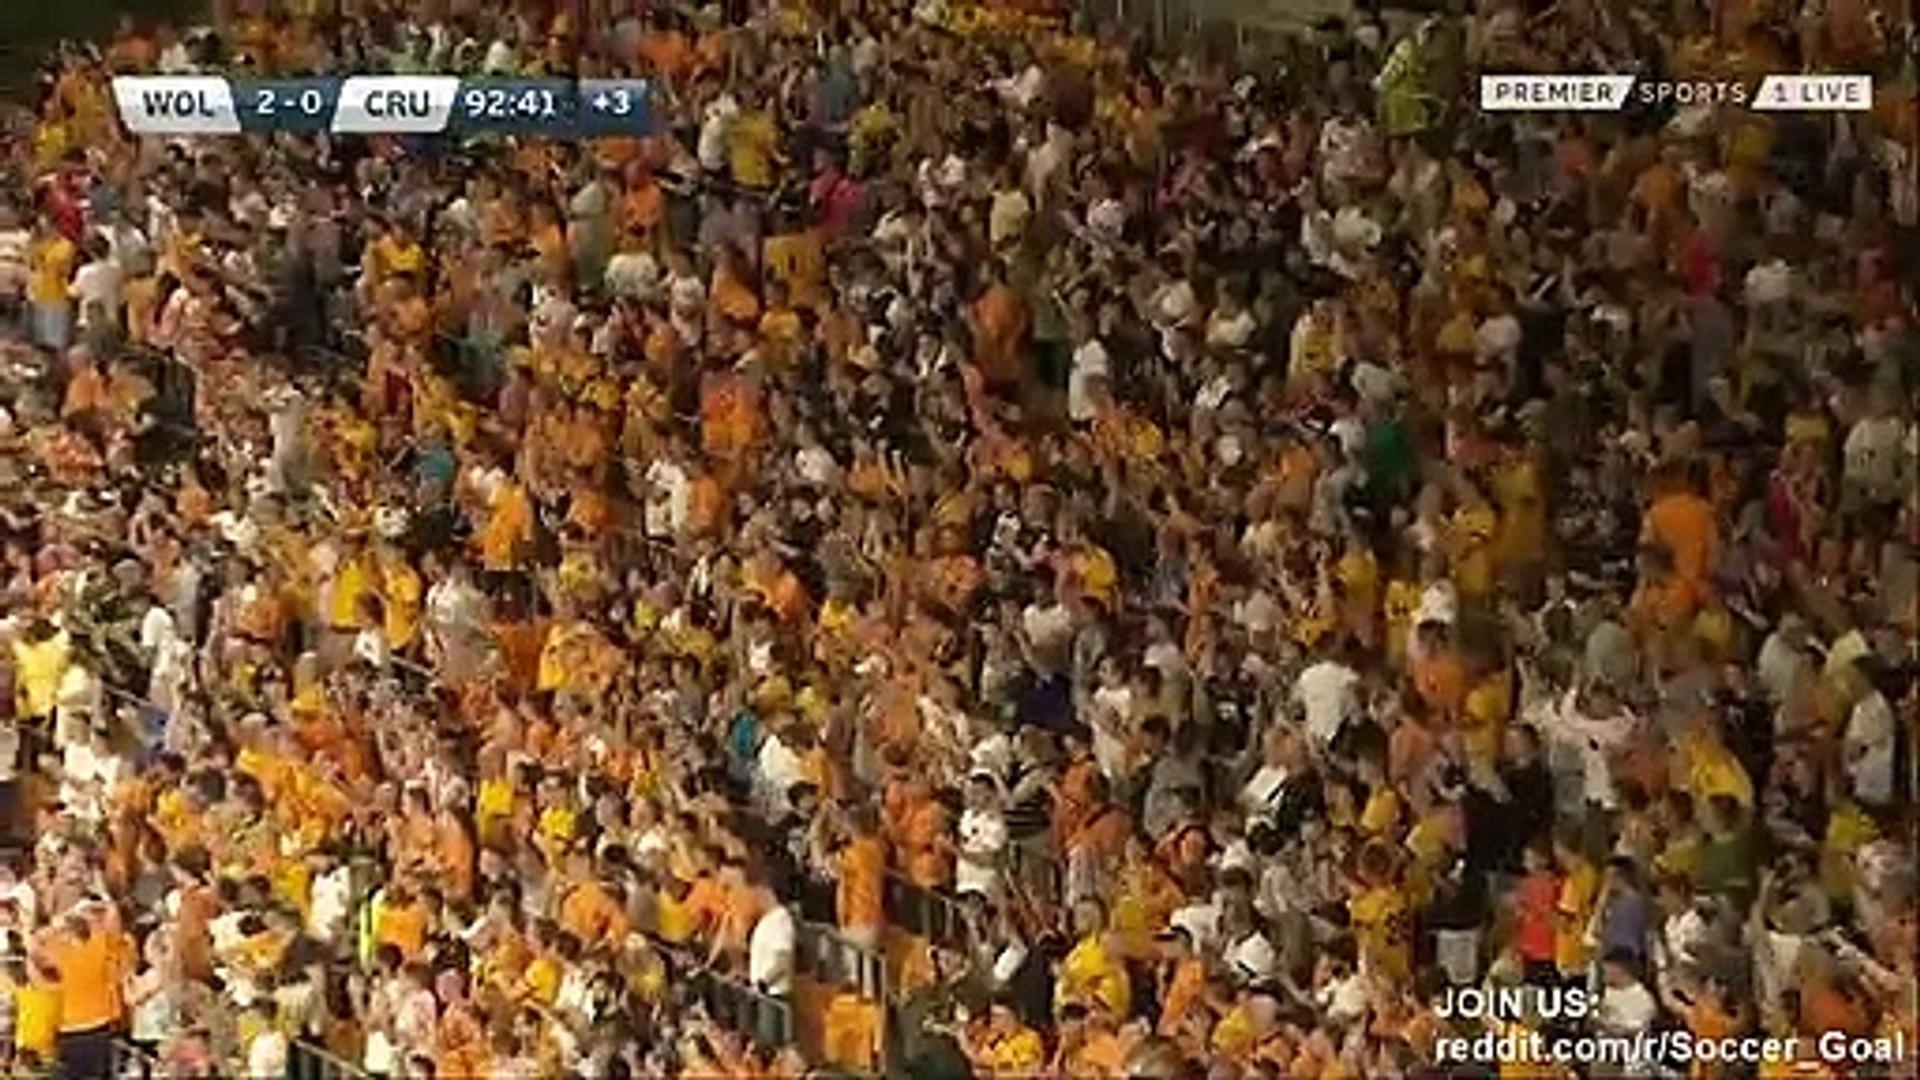 Ruben Vinagre Goal HD - Wolves 2 - 0 Crusaders - 25.07.2019 (Full Replay)